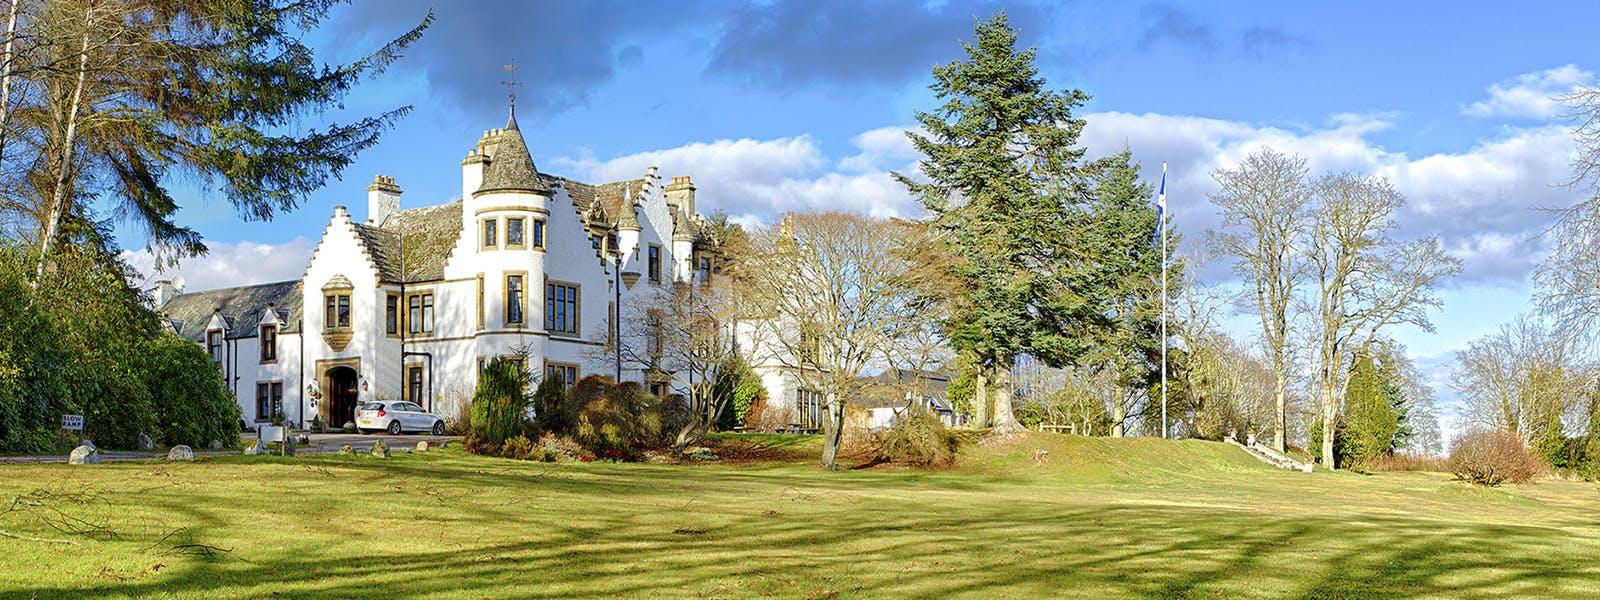 Kincraig Castle Hotel Scotland